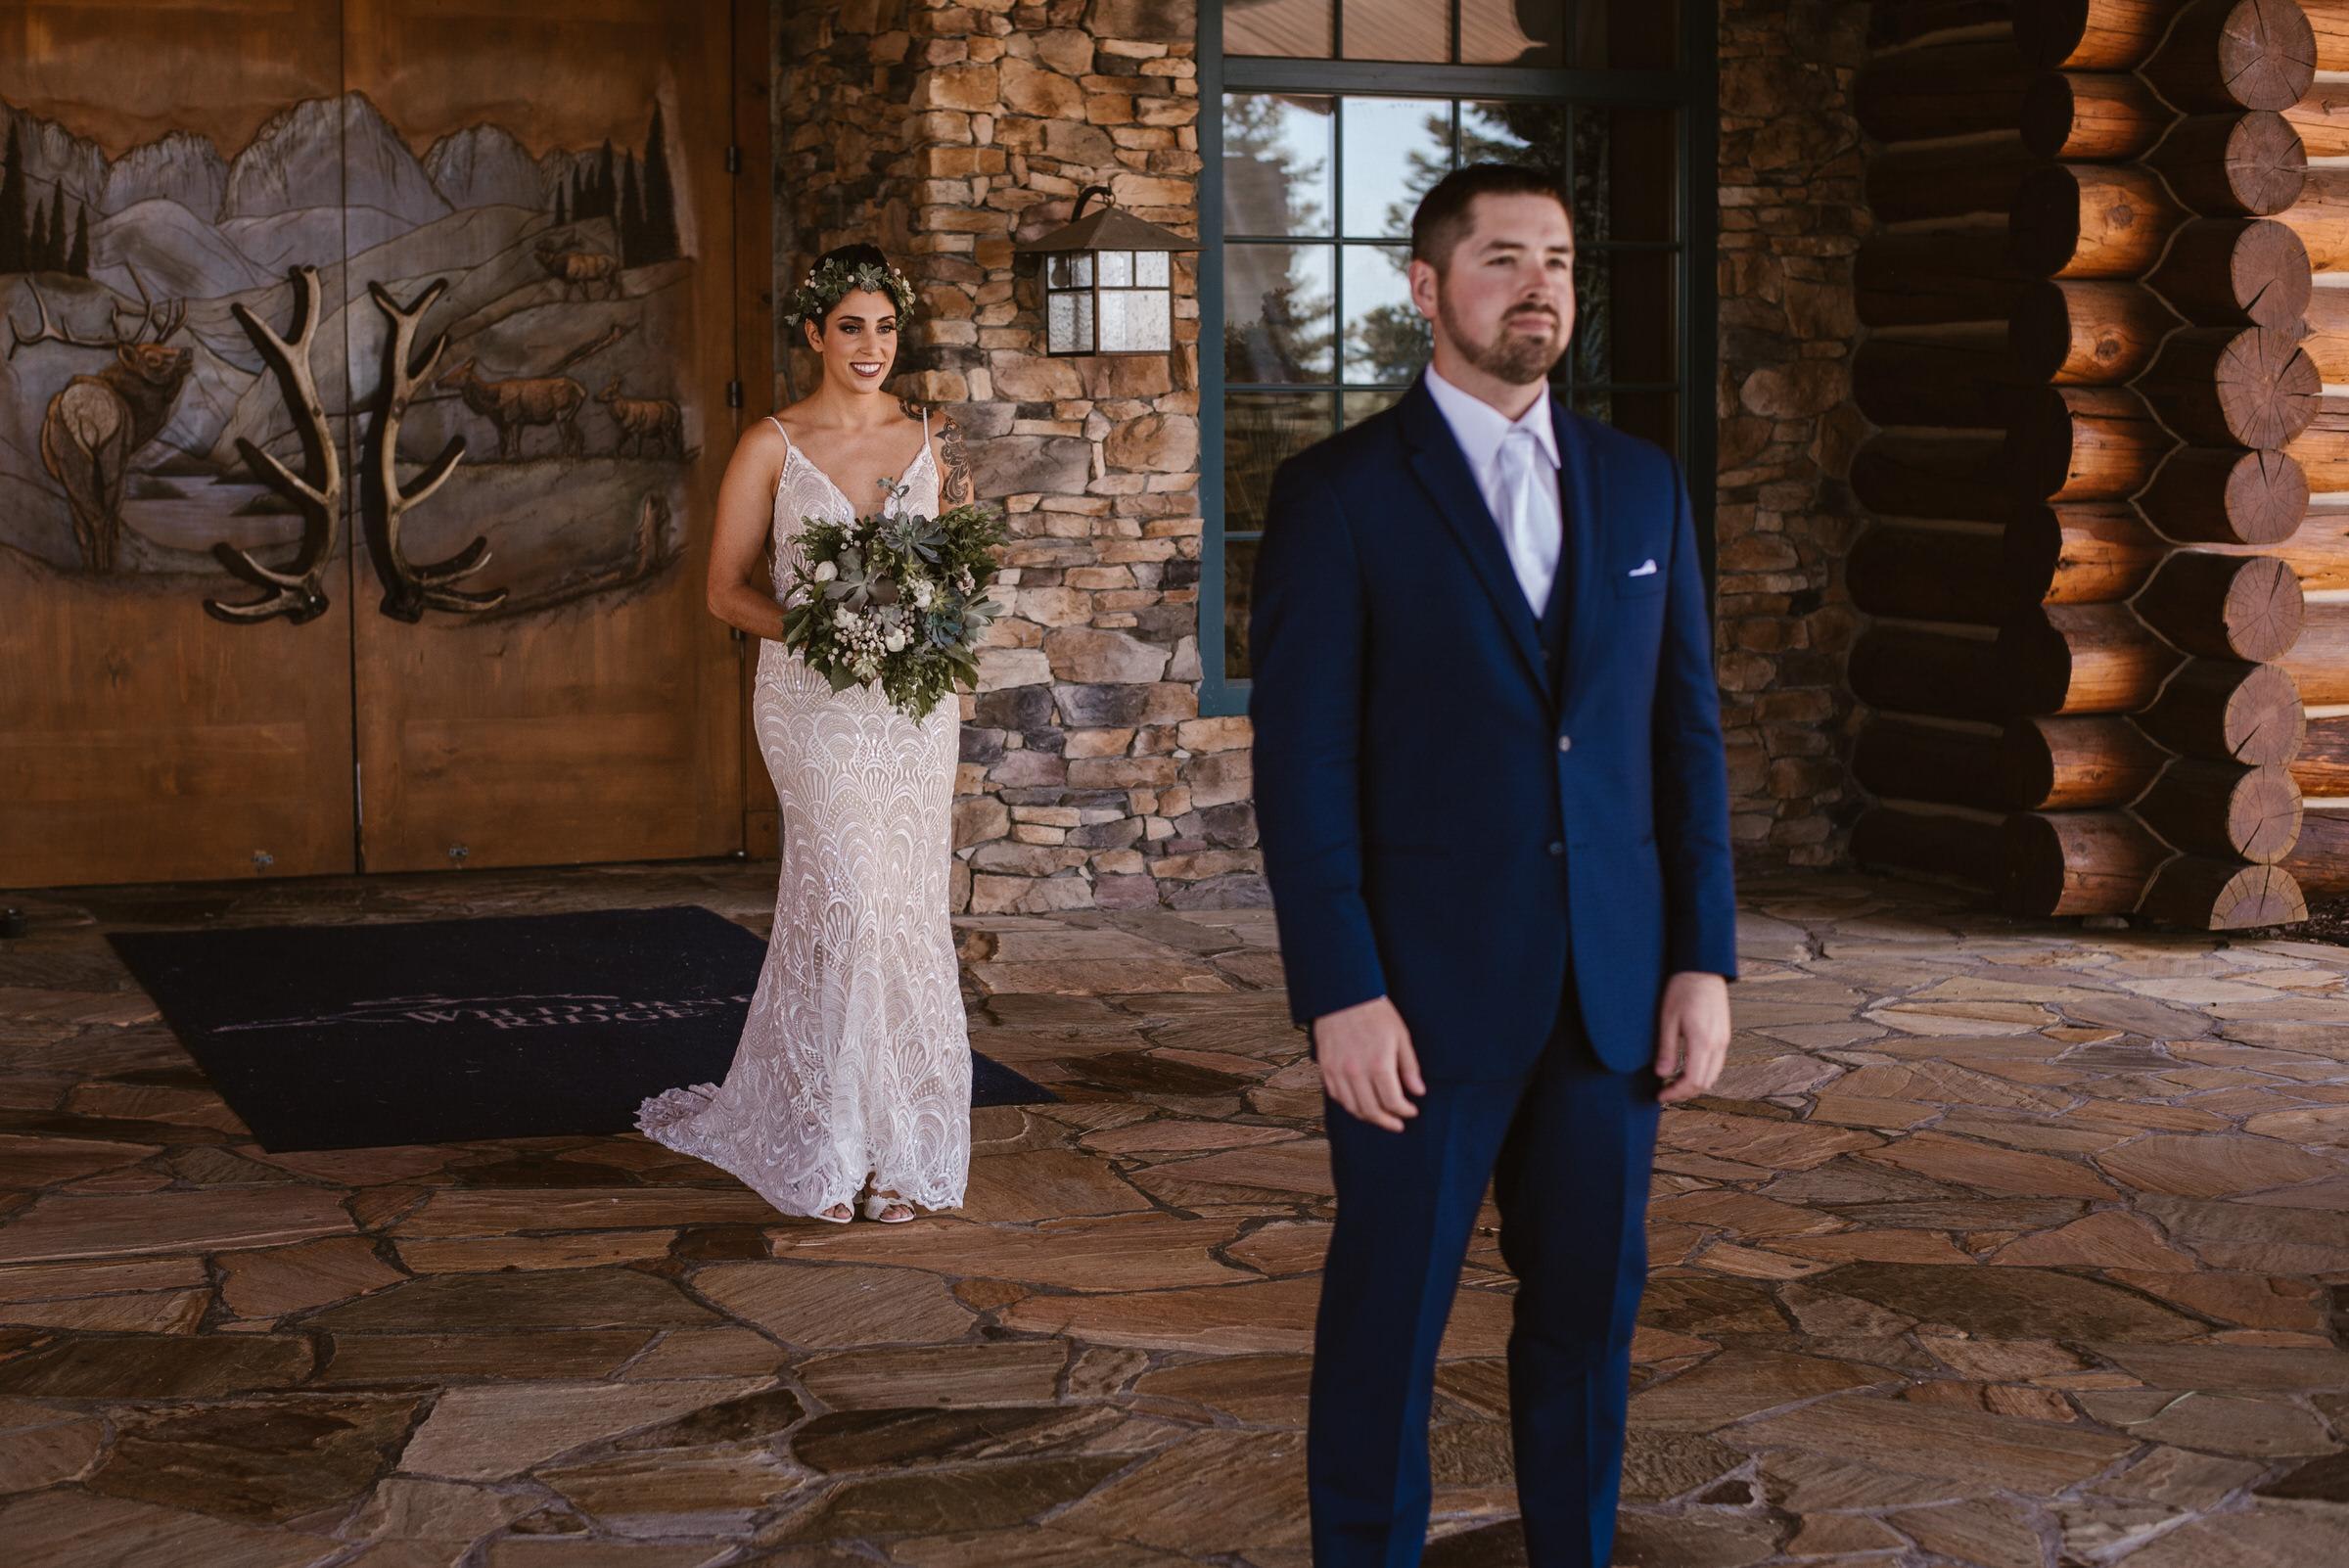 Wilderness-Ridge-Lincoln-Nebraska-Wedding-Kaylie-Sirek-Photography-027.jpg